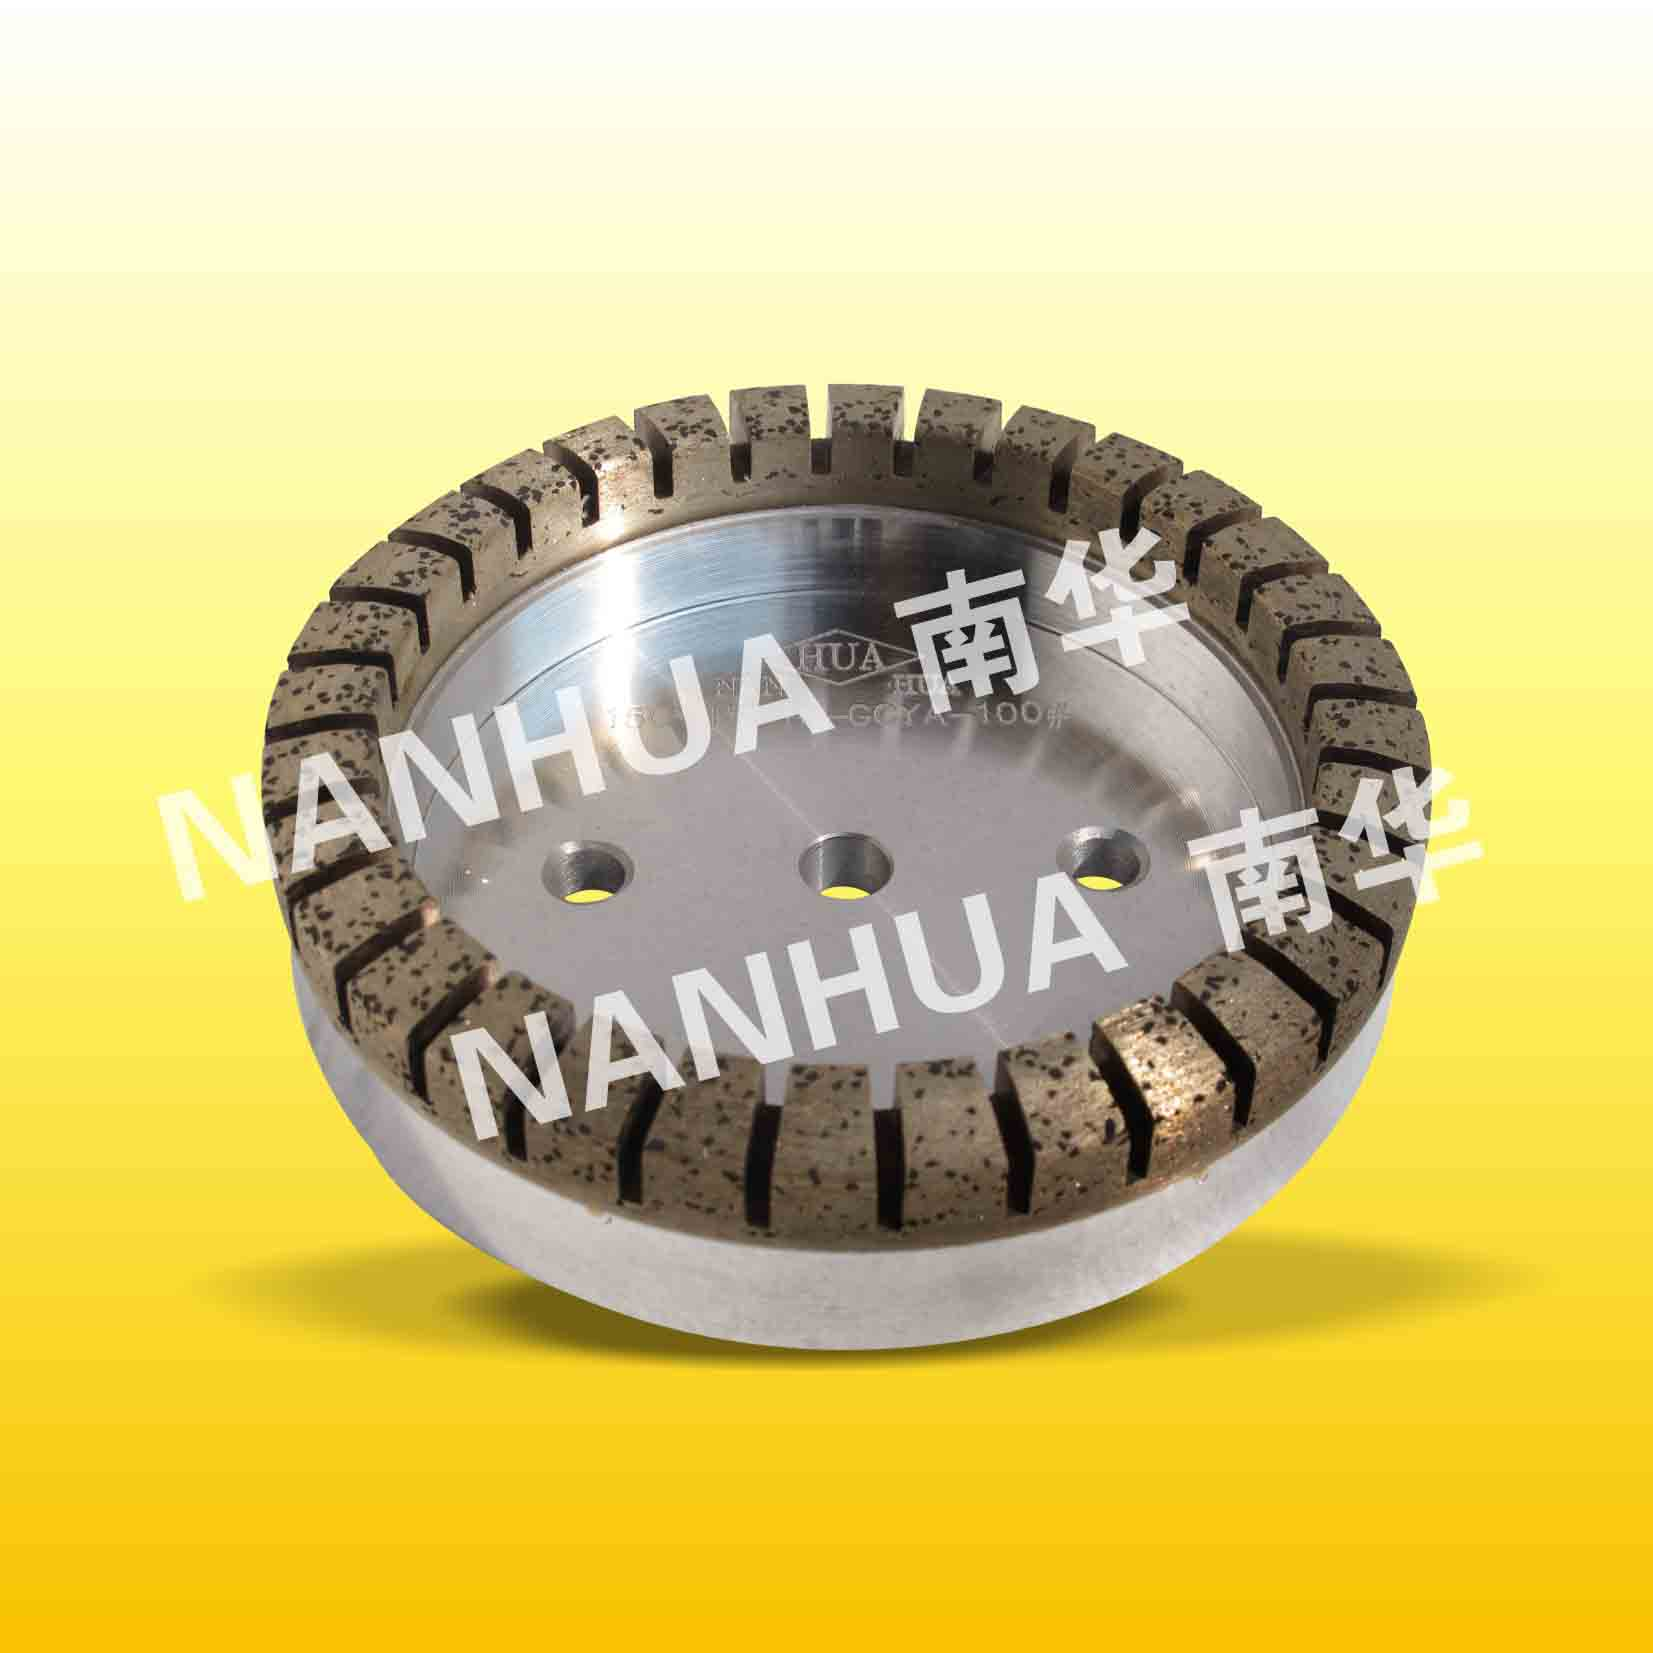 Full segmented Diamond Wheel